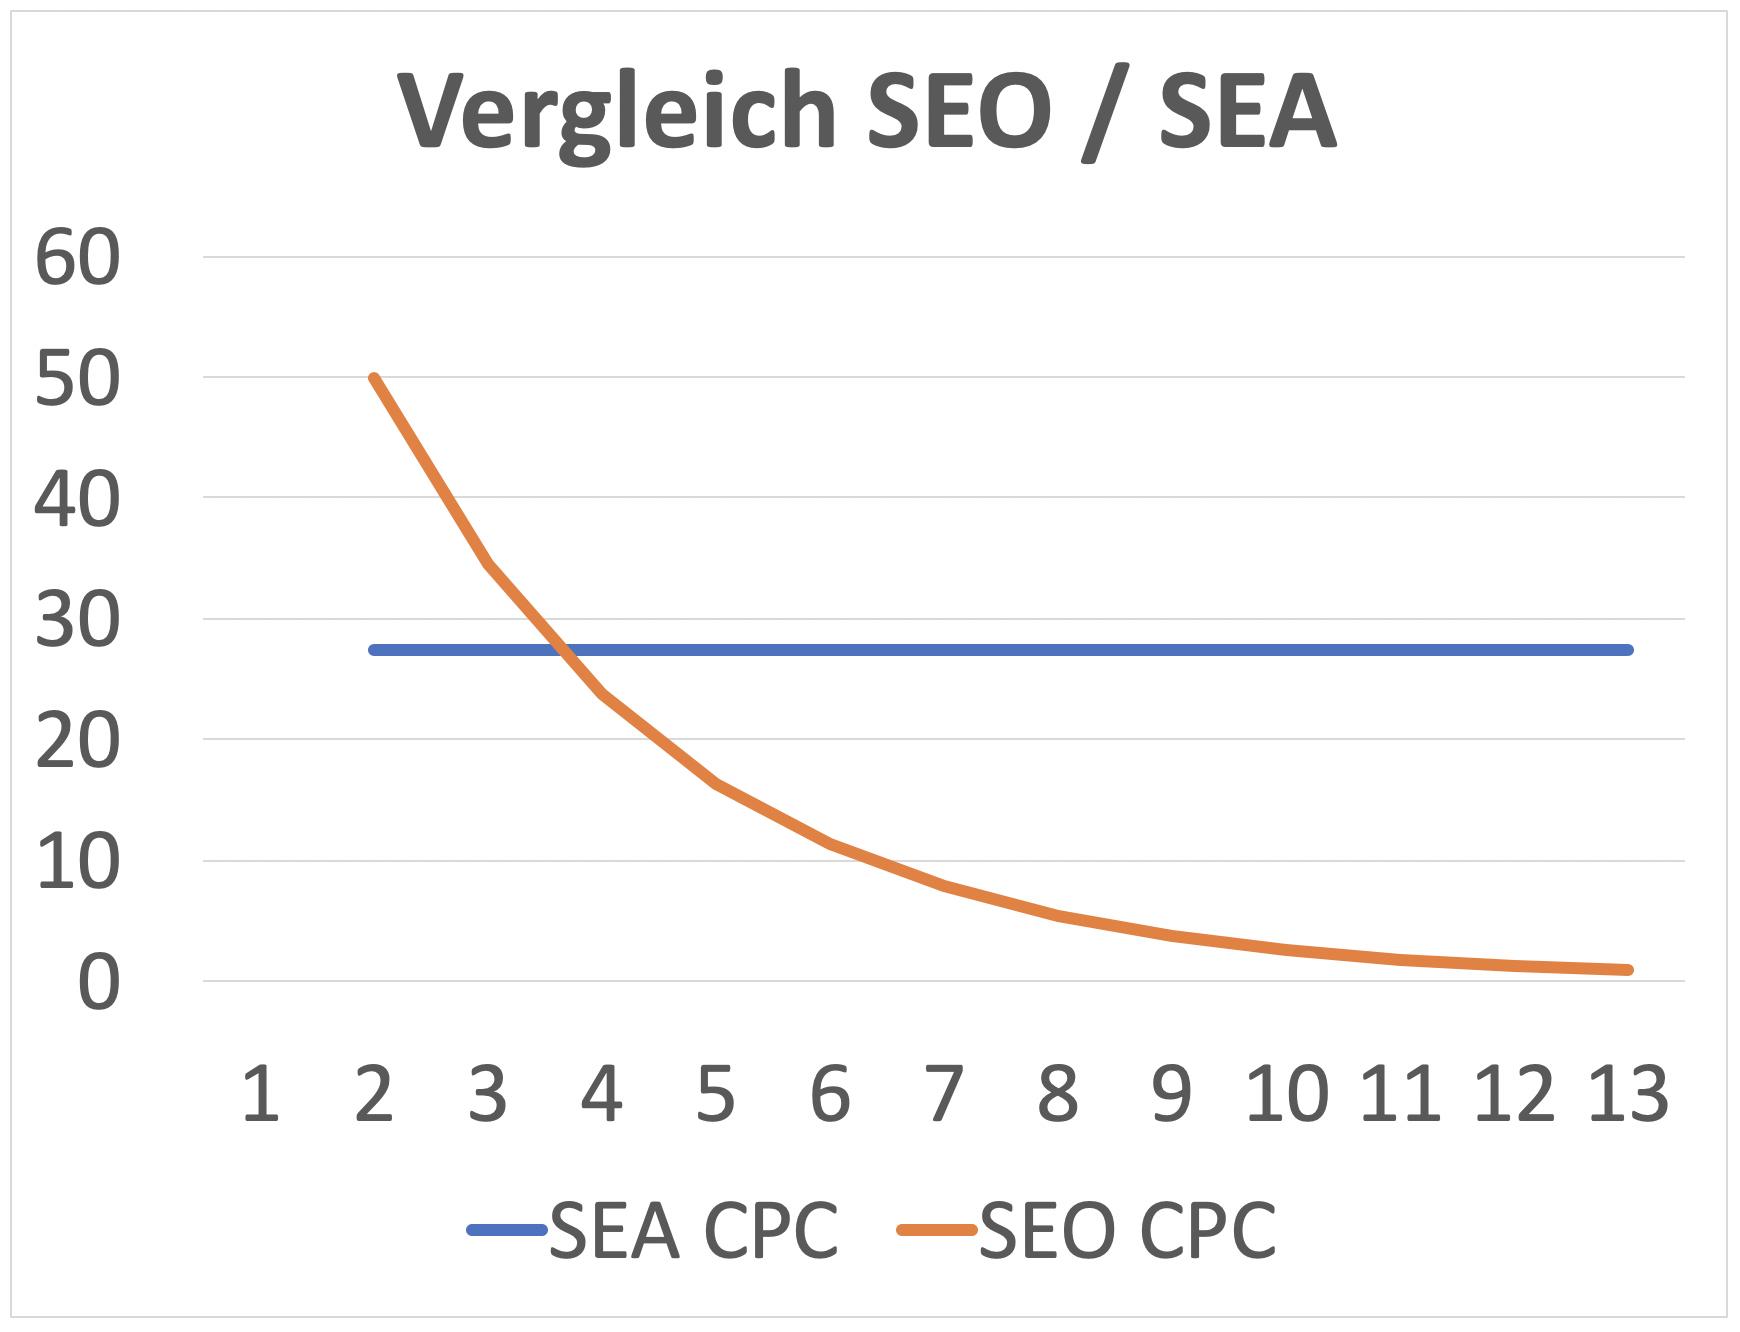 Vergleich SEO/SEA